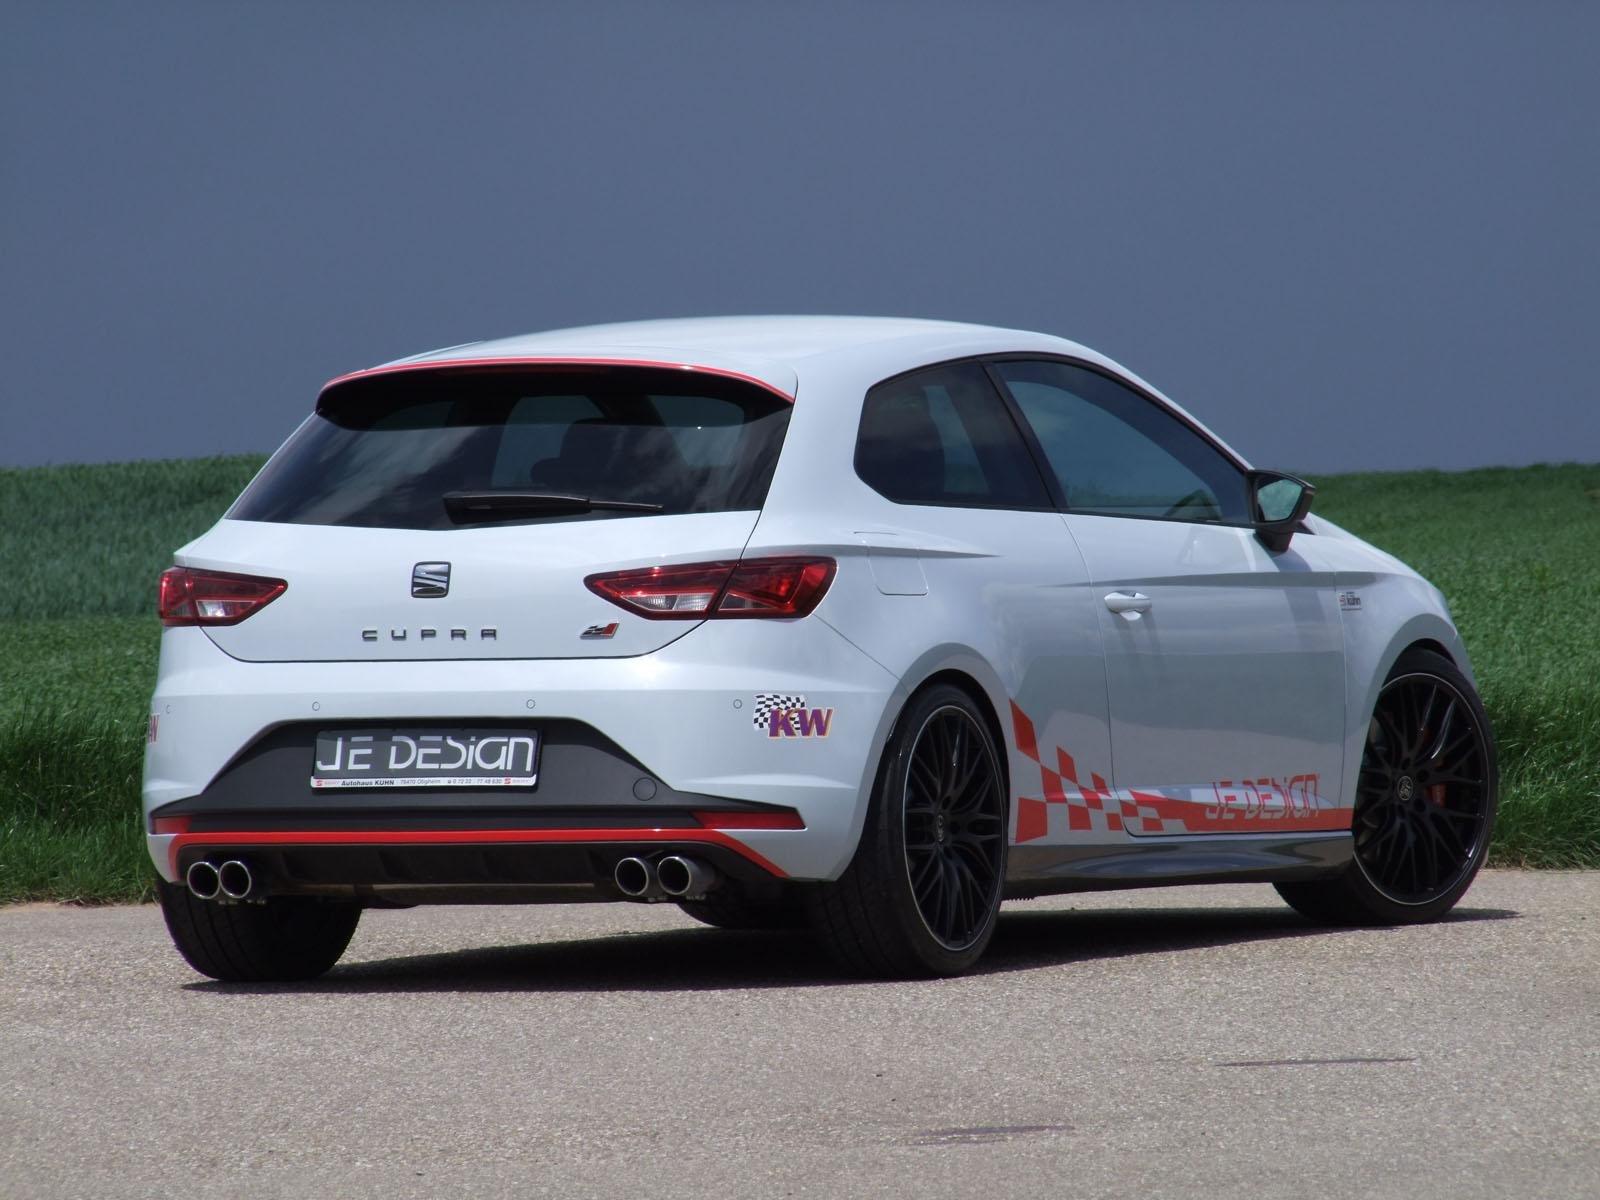 SEAT Leon Cupra JeDesign станет главным конкурентом Audi RS3 Sportback